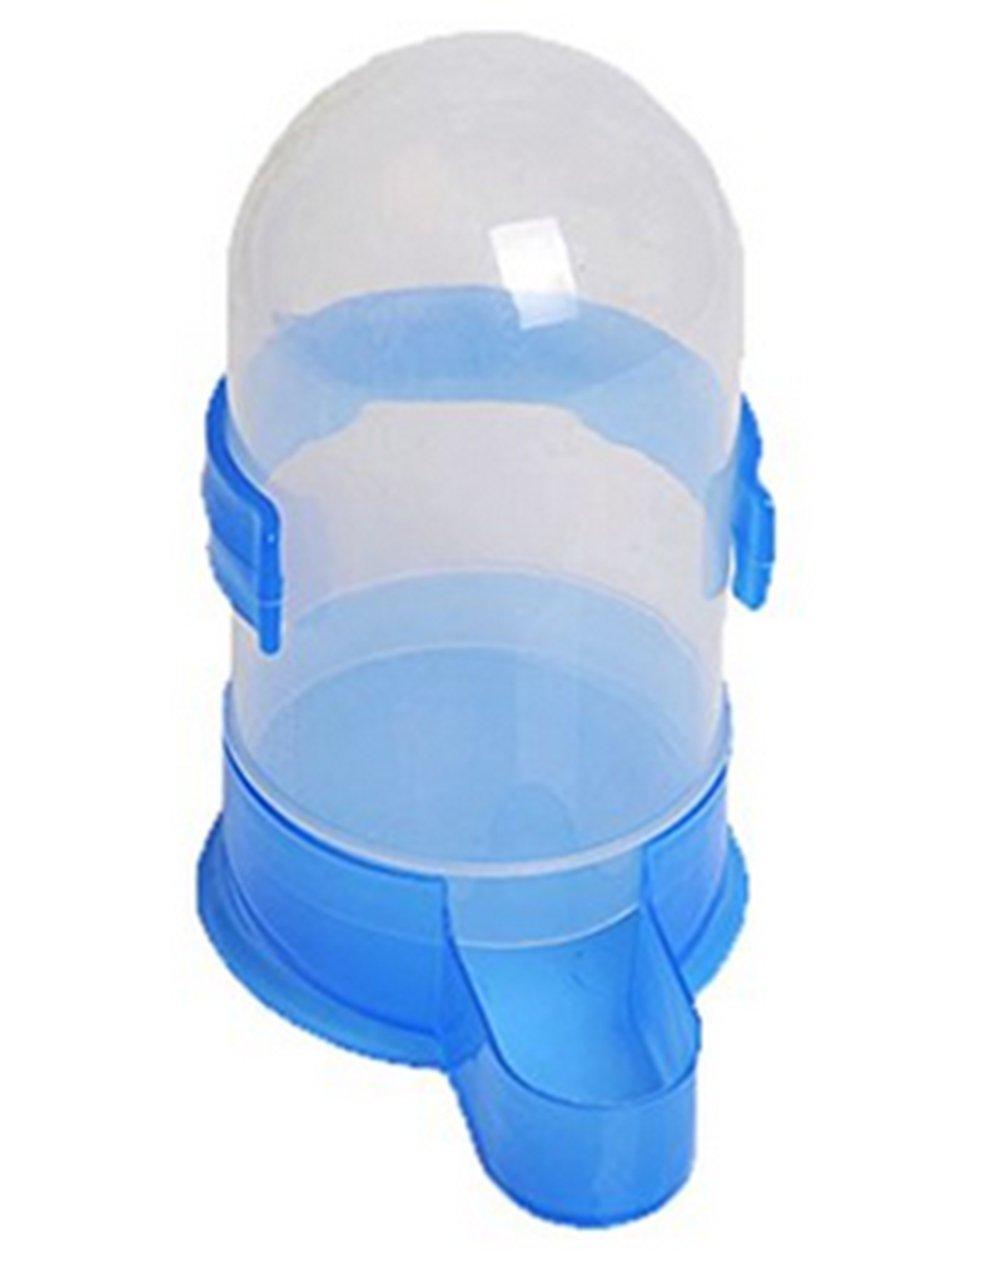 1xToruiwa Birds Water Bottle Blue Water Food Feeding Feeder for Birds Parrots Pigeons (Large)